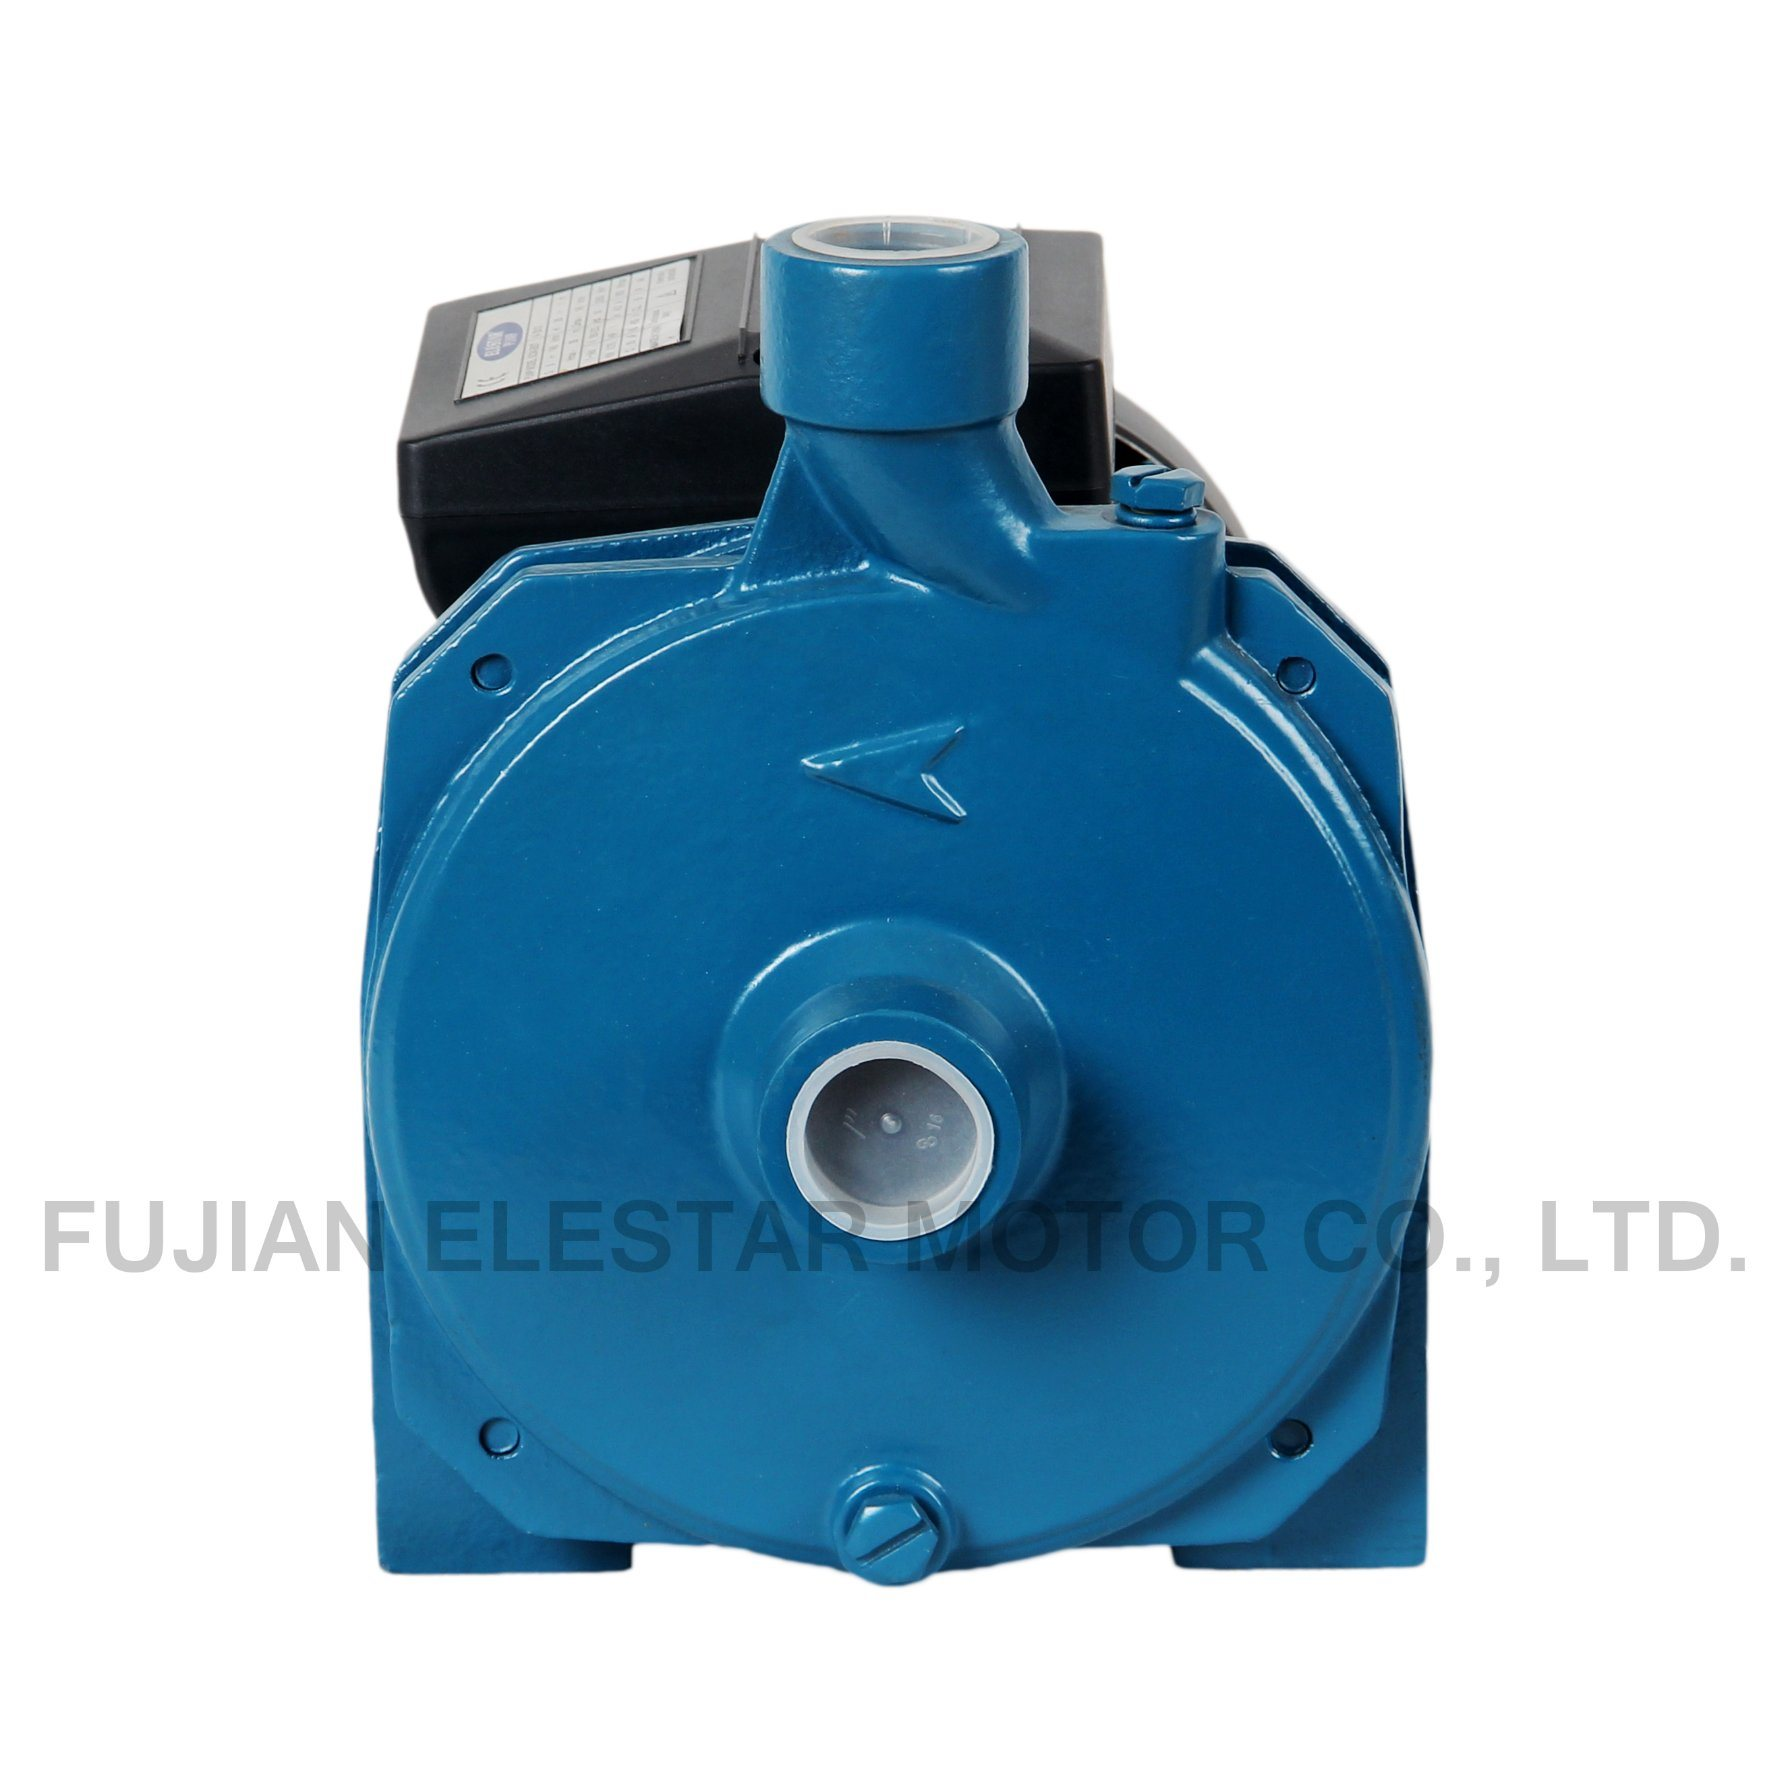 Scm Centrifugal Electric Clean Pumps